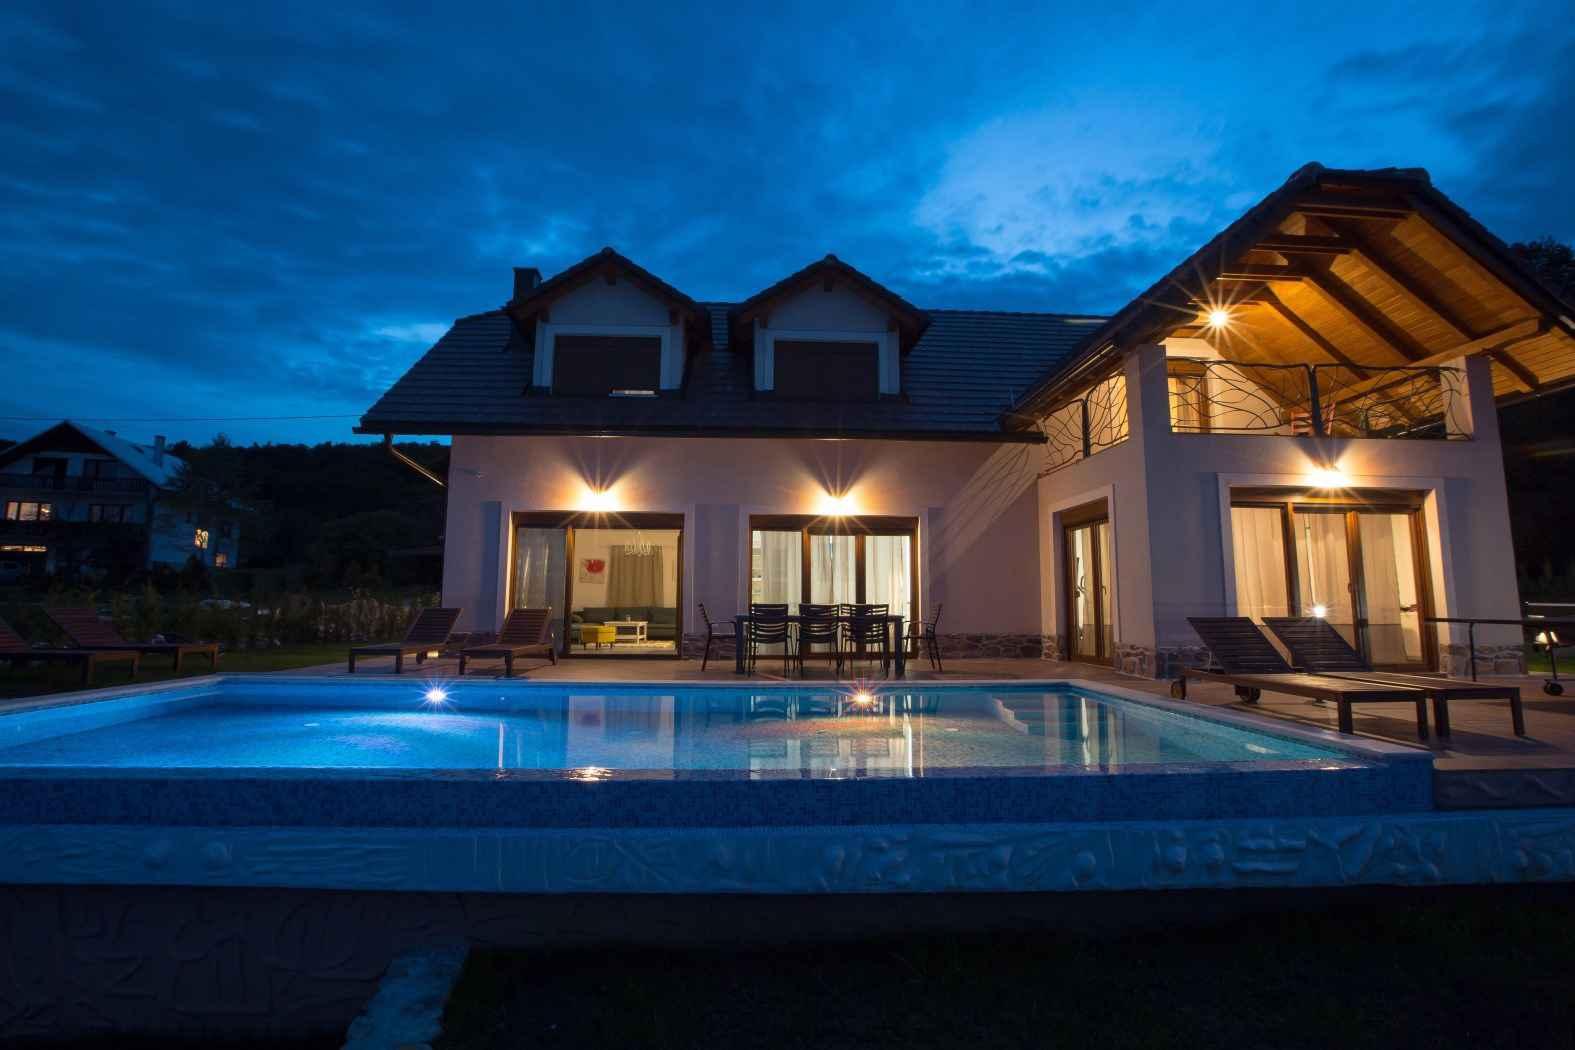 Ferienhaus mit Pool am See gelegen (2047240), Ogulin, , Mittelkroatien, Kroatien, Bild 2